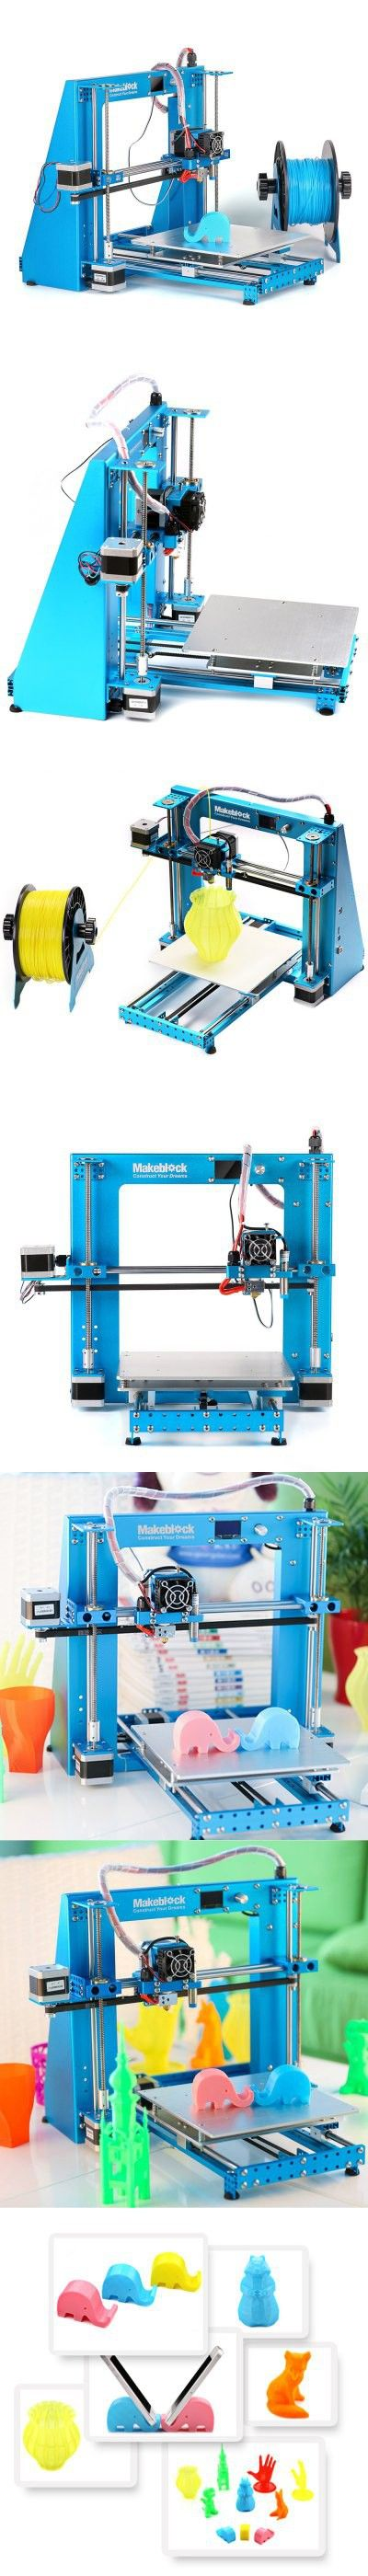 3D Printer & Supplies | Makeblock mElephant 3D Printer Electronic Module